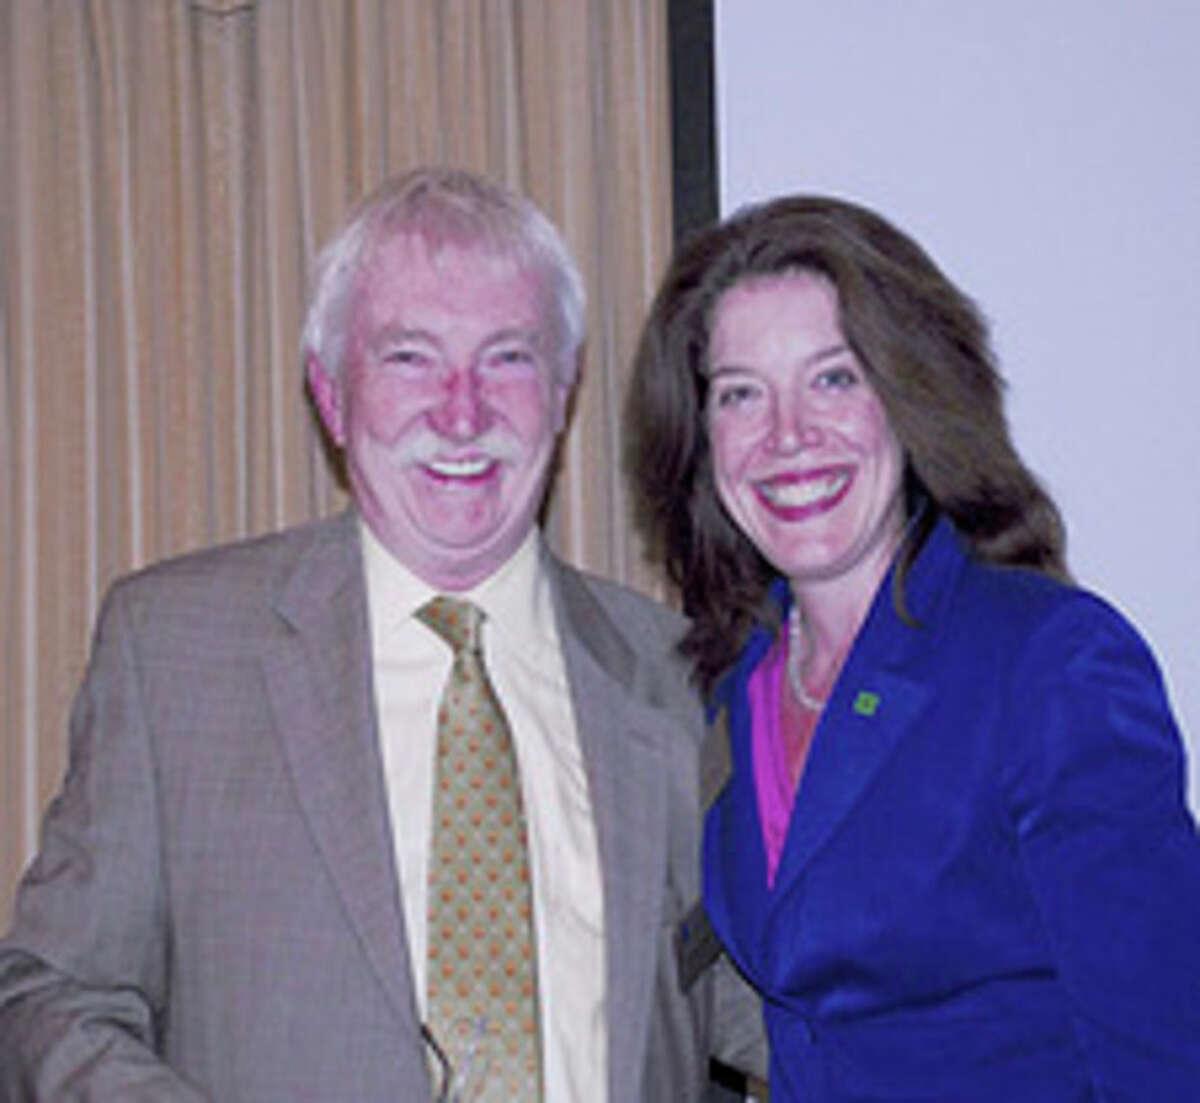 Contributed photo HBRA Life Director John Murren, and President Elect Maureen Hanley- Bellitto